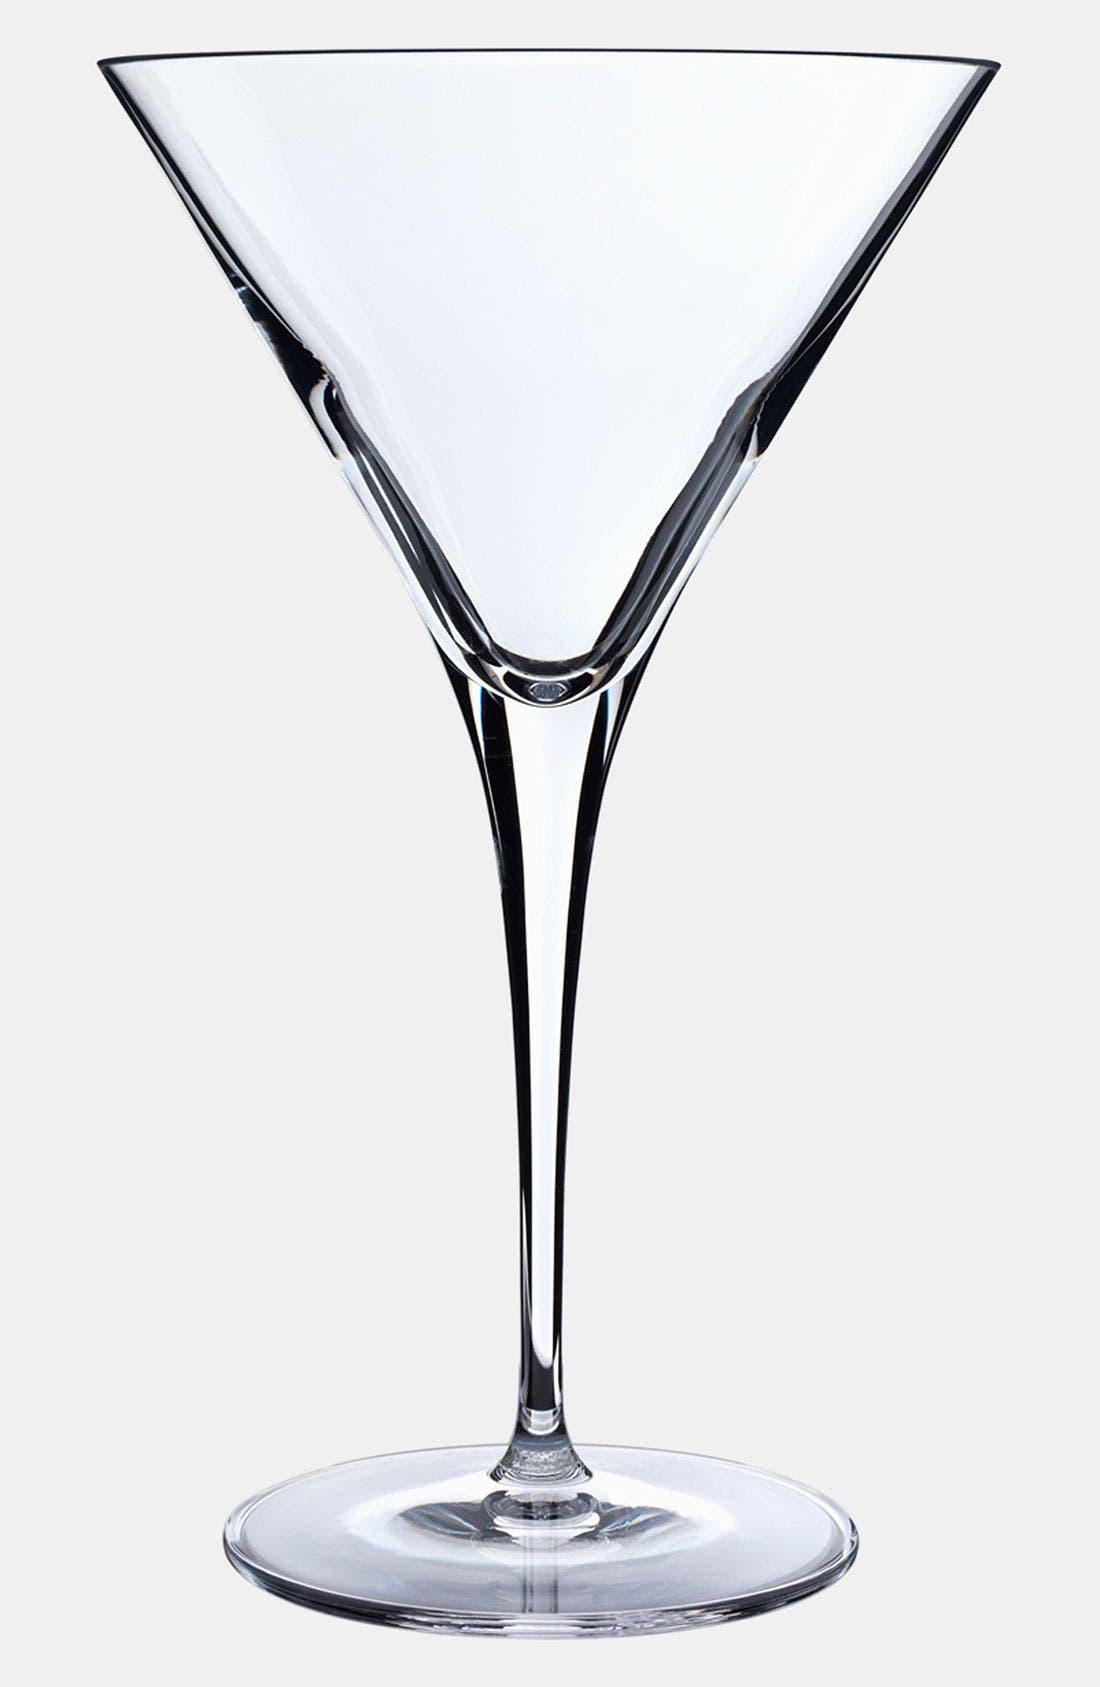 Main Image - Luigi Bormioli Martini Glasses (Set of 4)